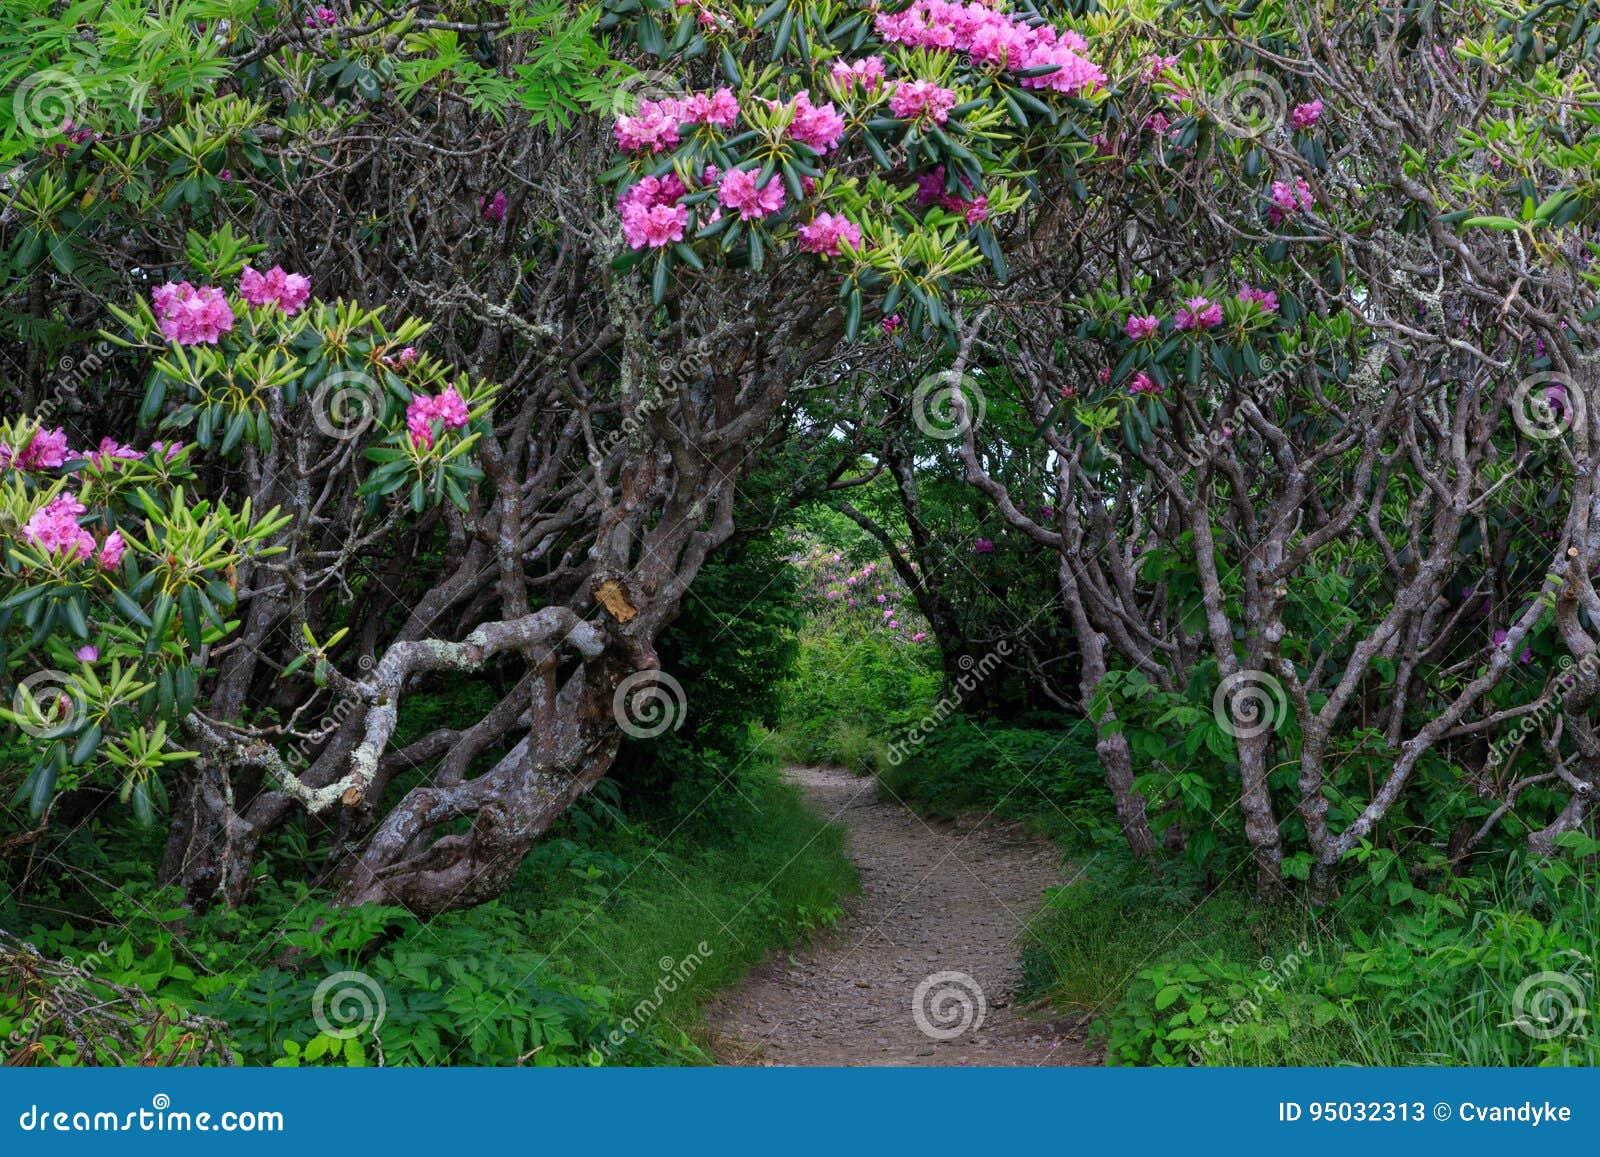 Entrance Craggy Garden Pinnacle Trail North Carolina